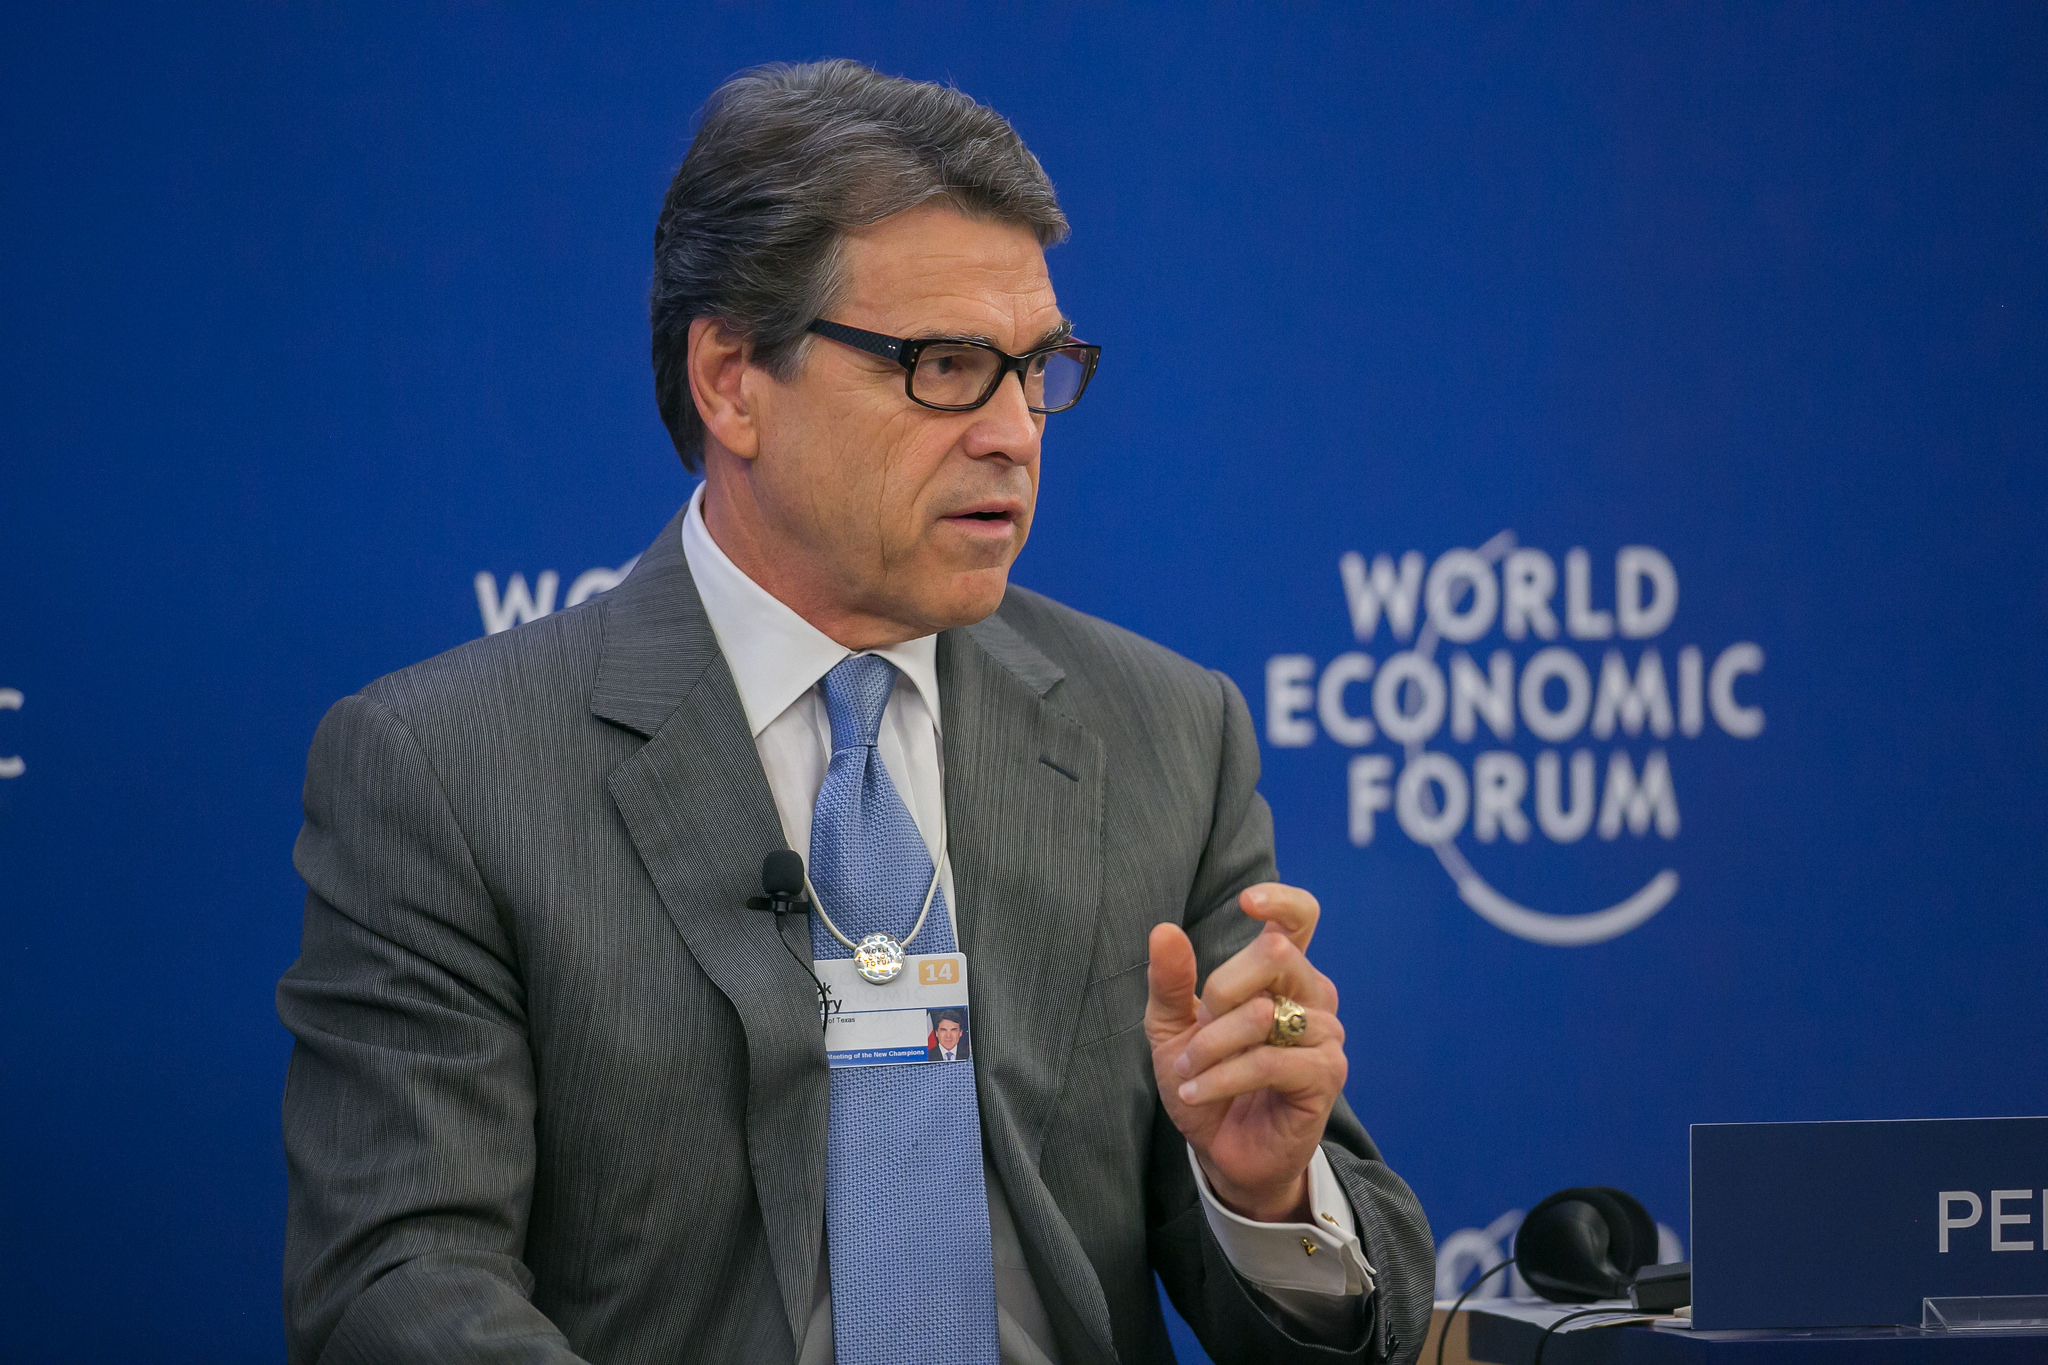 Photo credit: World Economic Forum